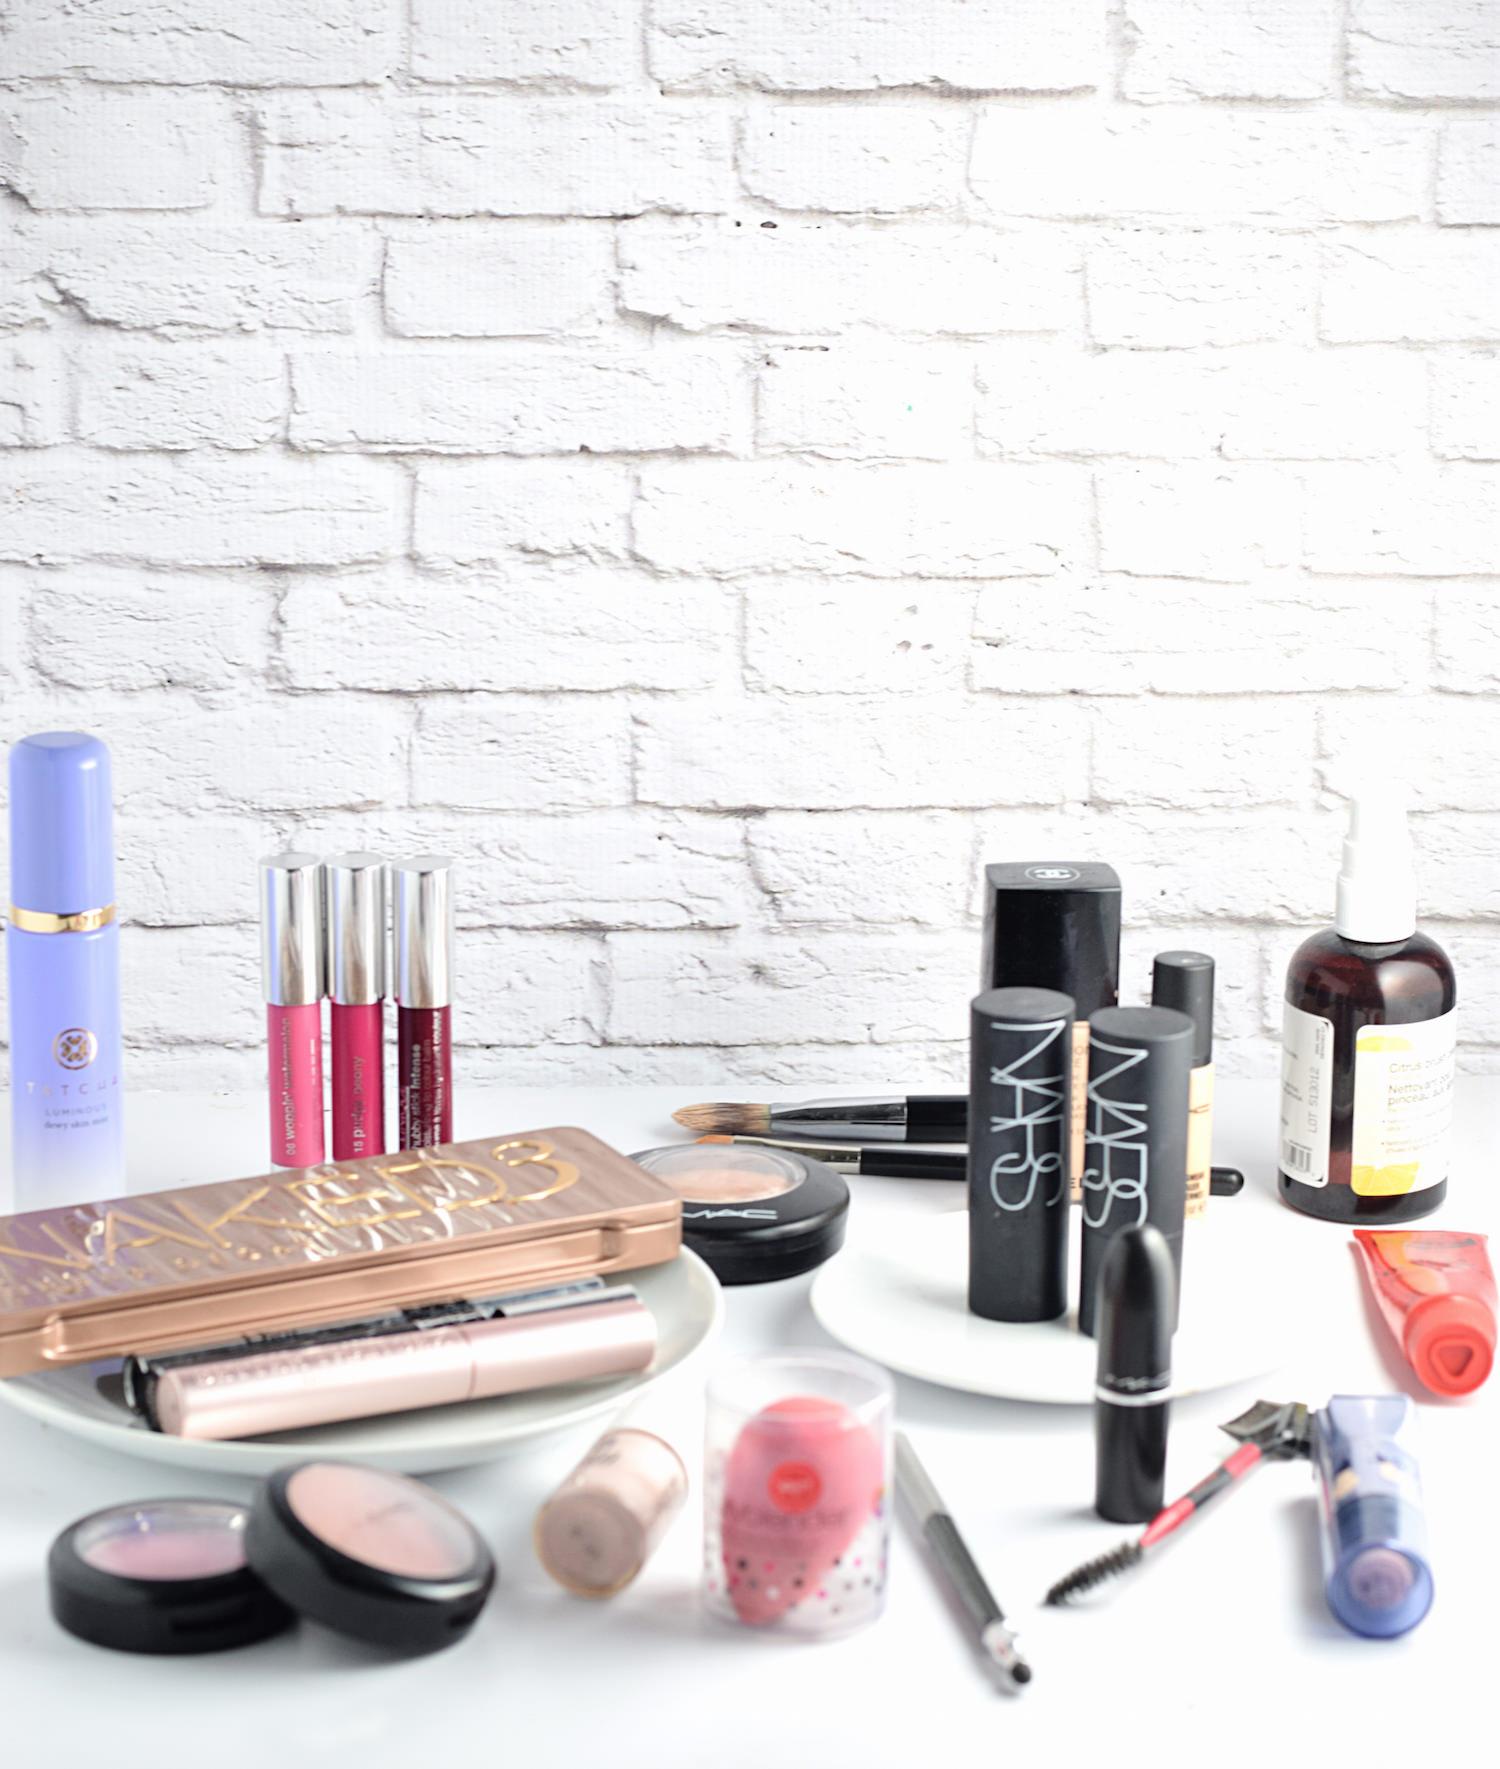 My Current Favorite Makeup Products   TrufflesandTrends.com